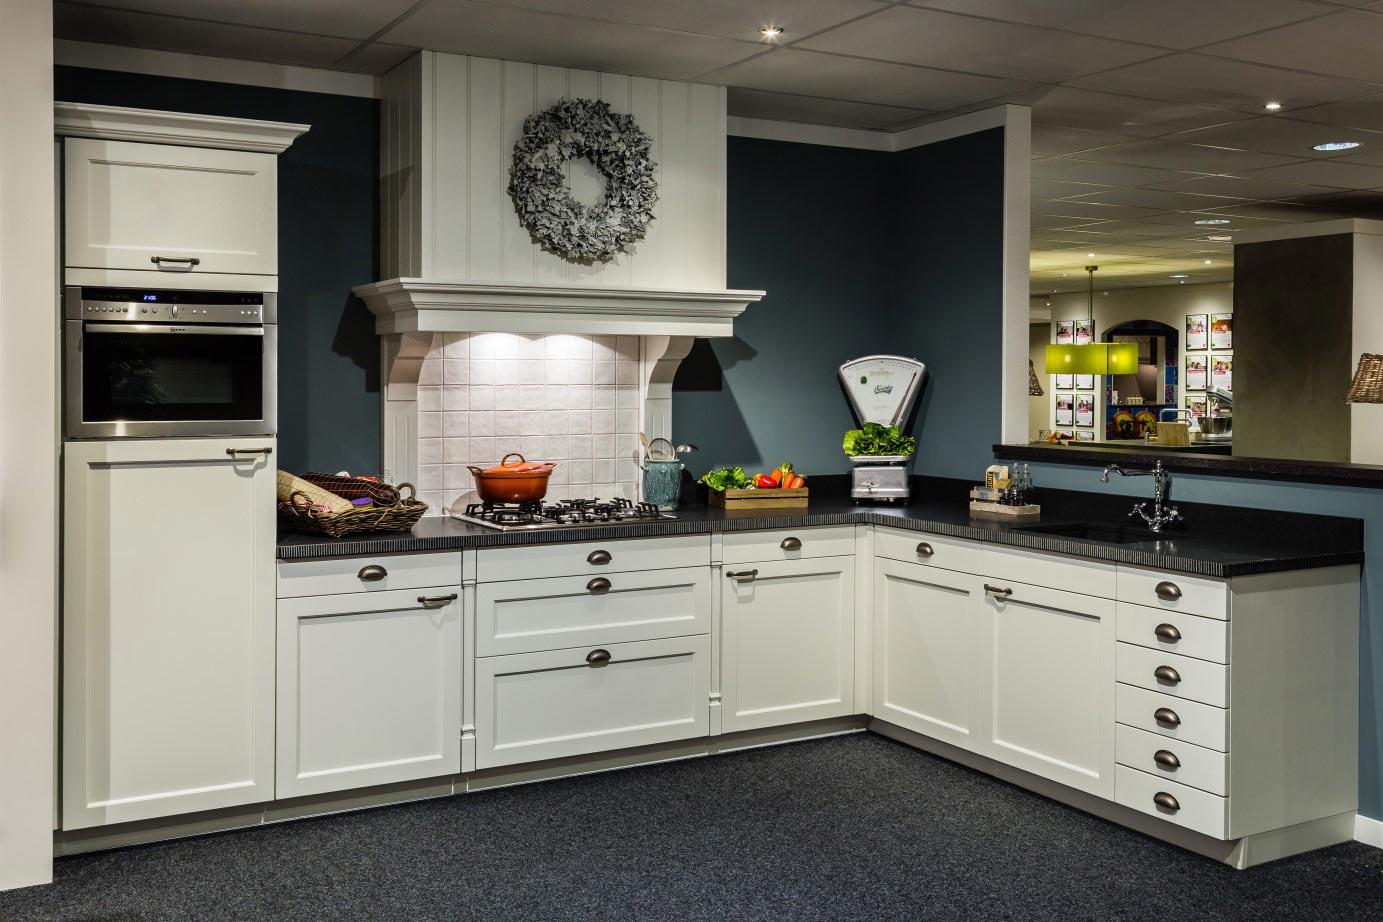 Keuken Badkamer Culemborg : Keukens culemborg ervaar onze kwaliteitskeukens db keukens